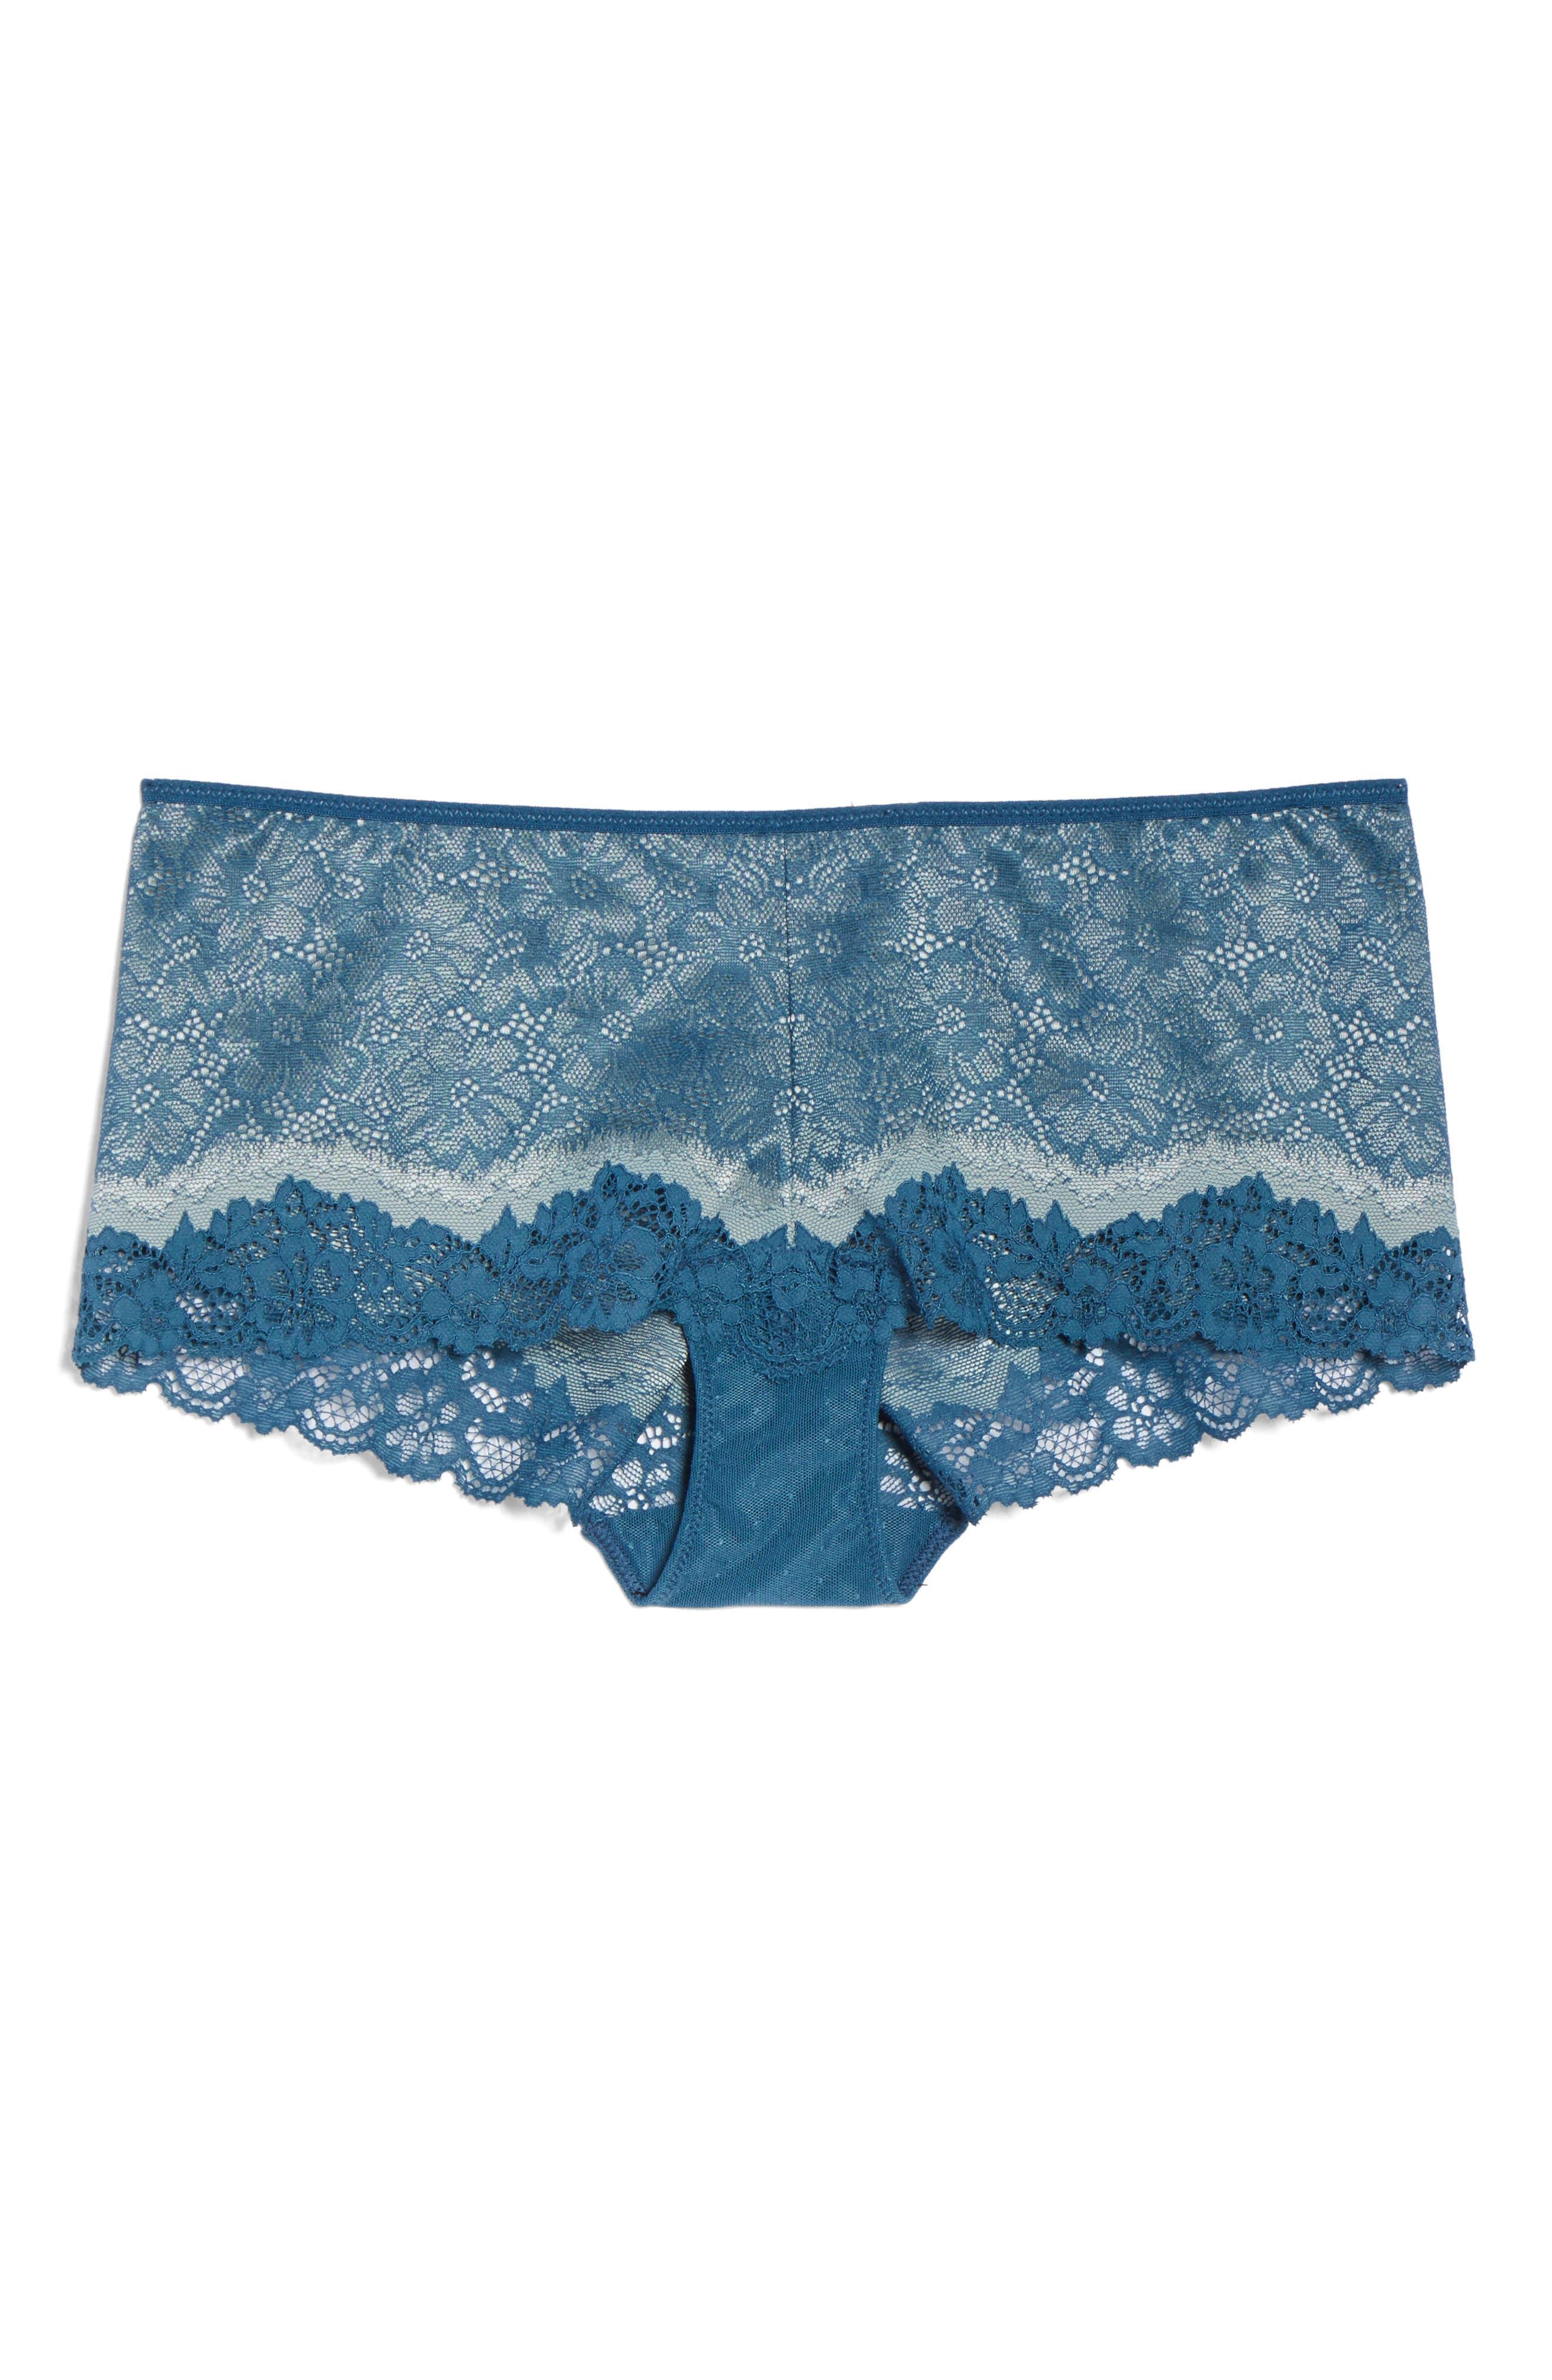 Lace Boyshorts,                             Alternate thumbnail 6, color,                             MAJOLICA BLUE/ SLATE